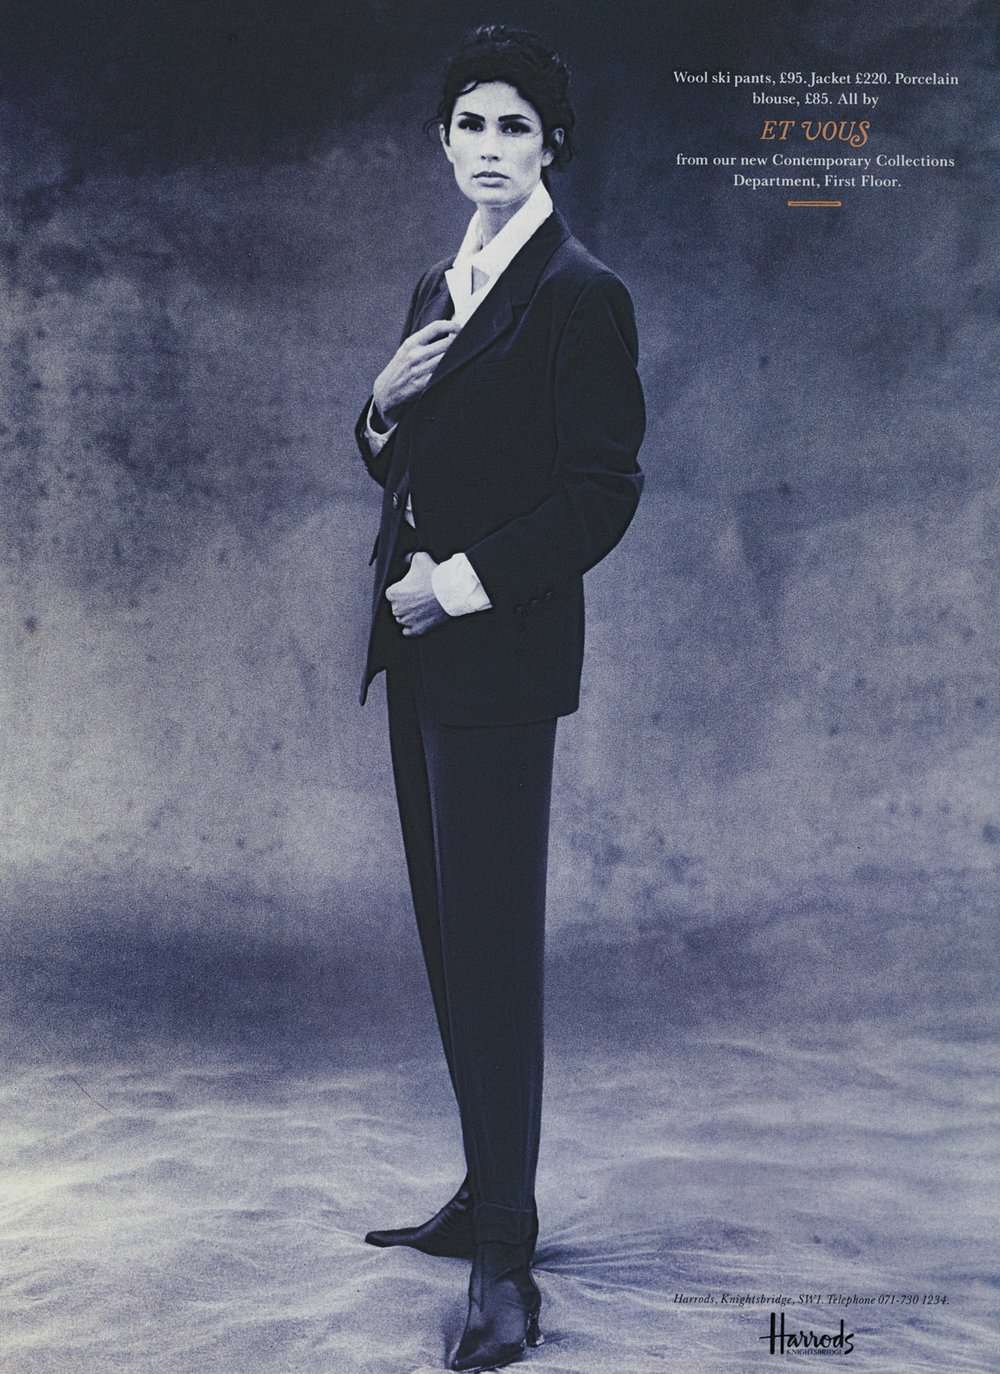 Kim Harrods.jpg